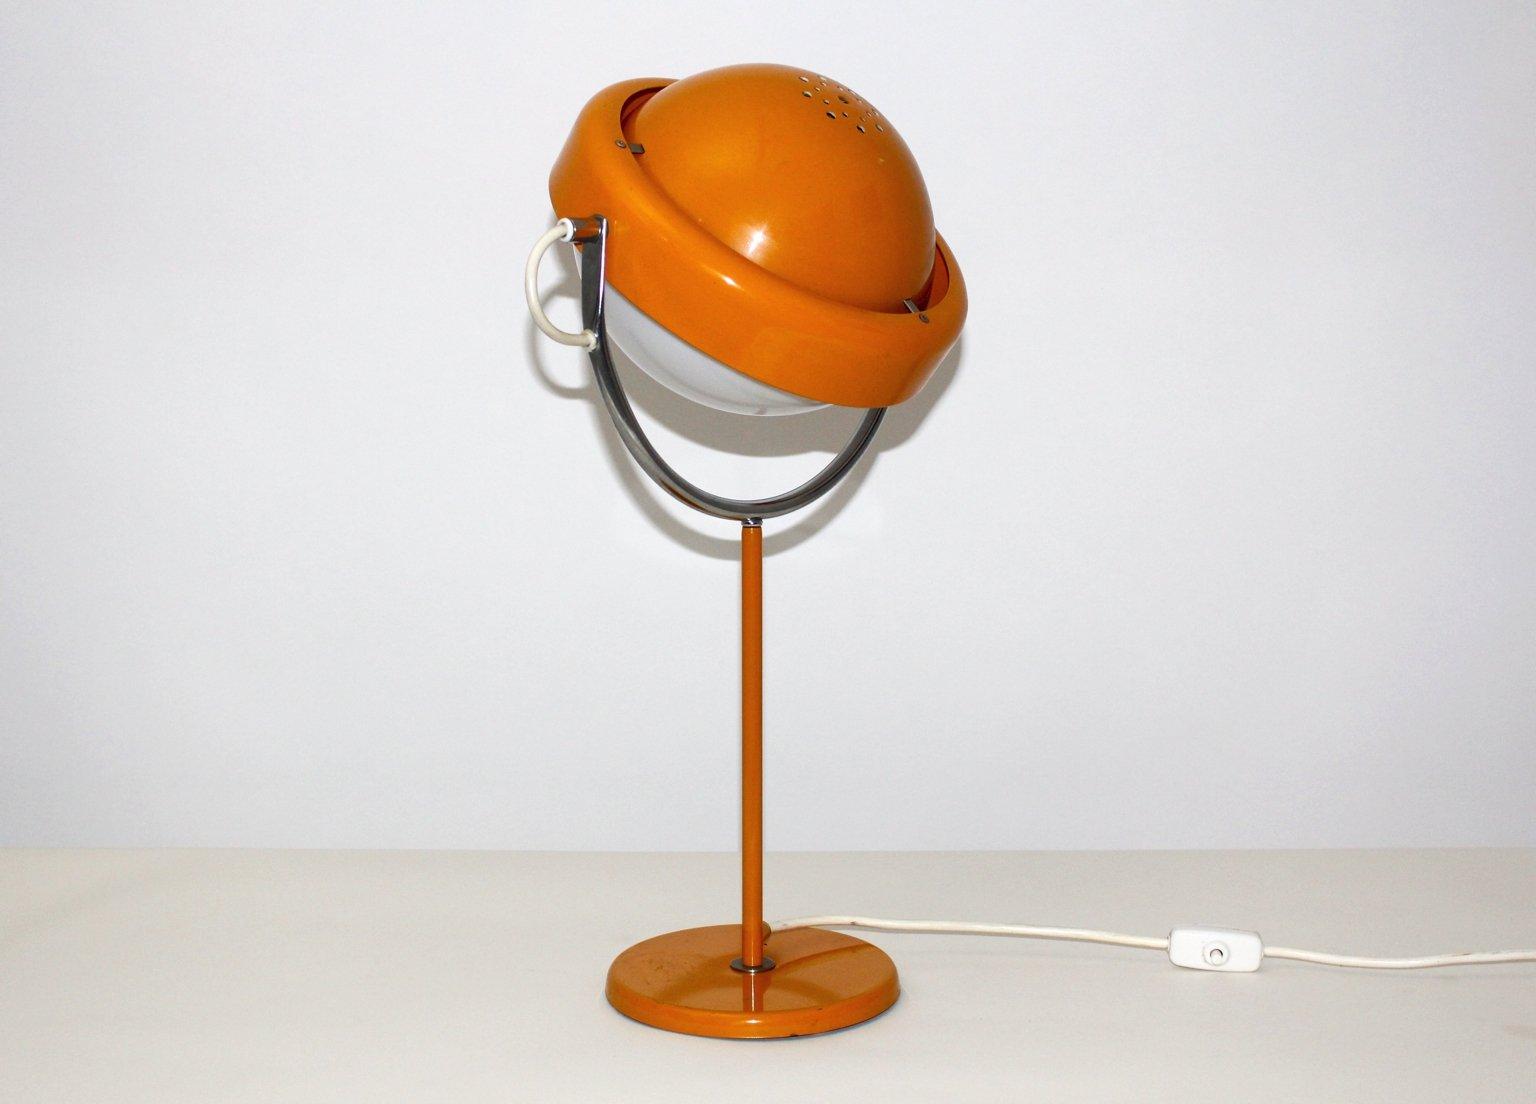 lamp by table costanzina led categories lighting orange aluminium luceplan tischleuchte lamps